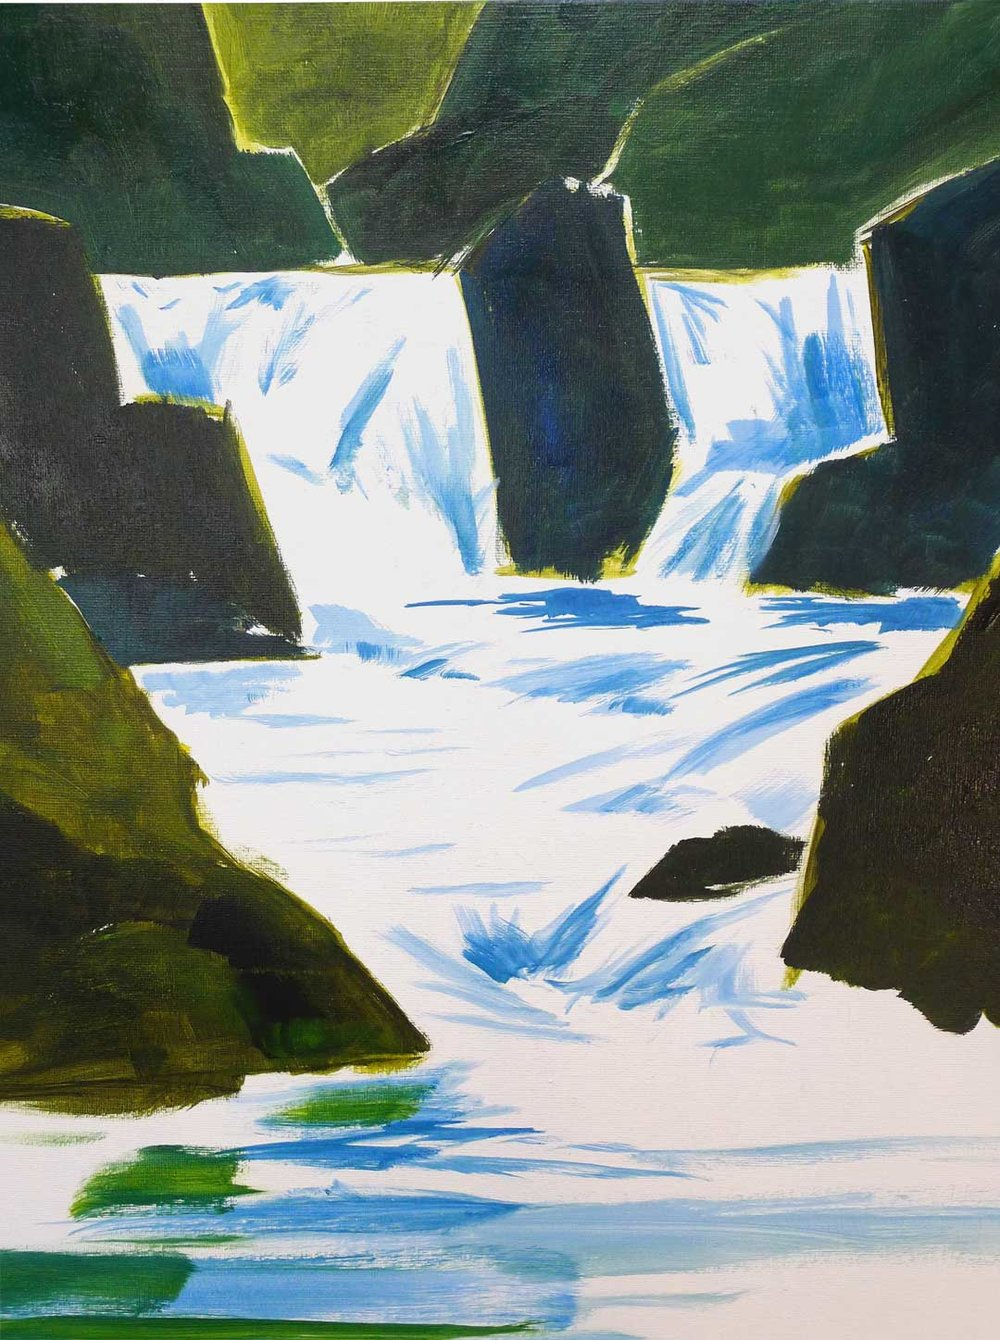 waterfall-paint-demo-4.jpg